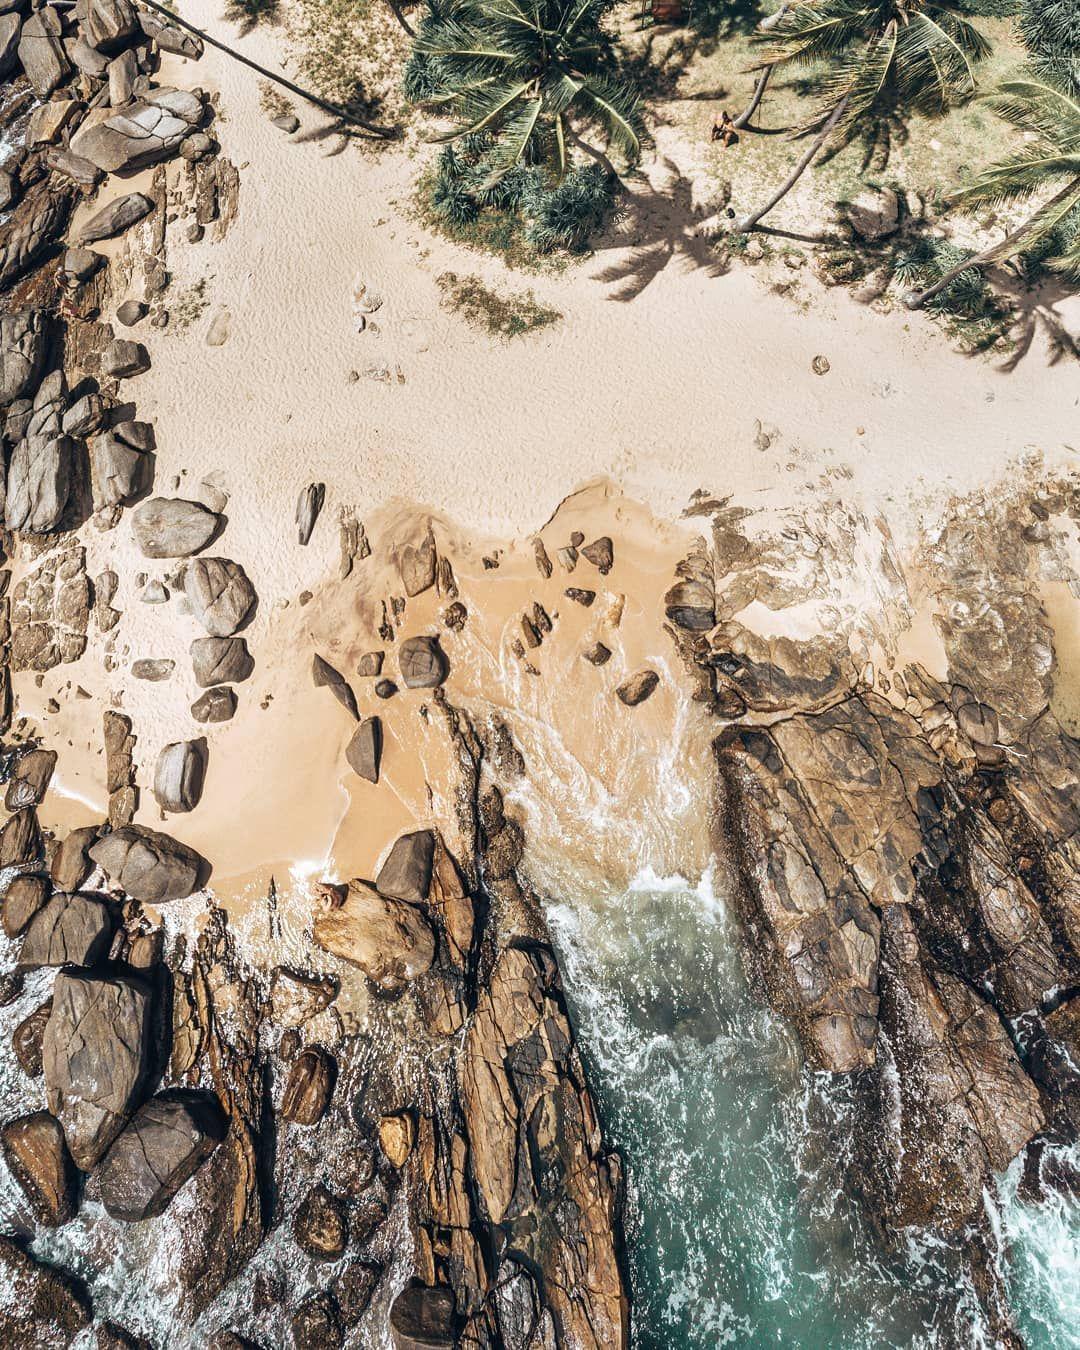 Pin On Yulneverroamalone Instagram Drone aerial shot trees beach coast